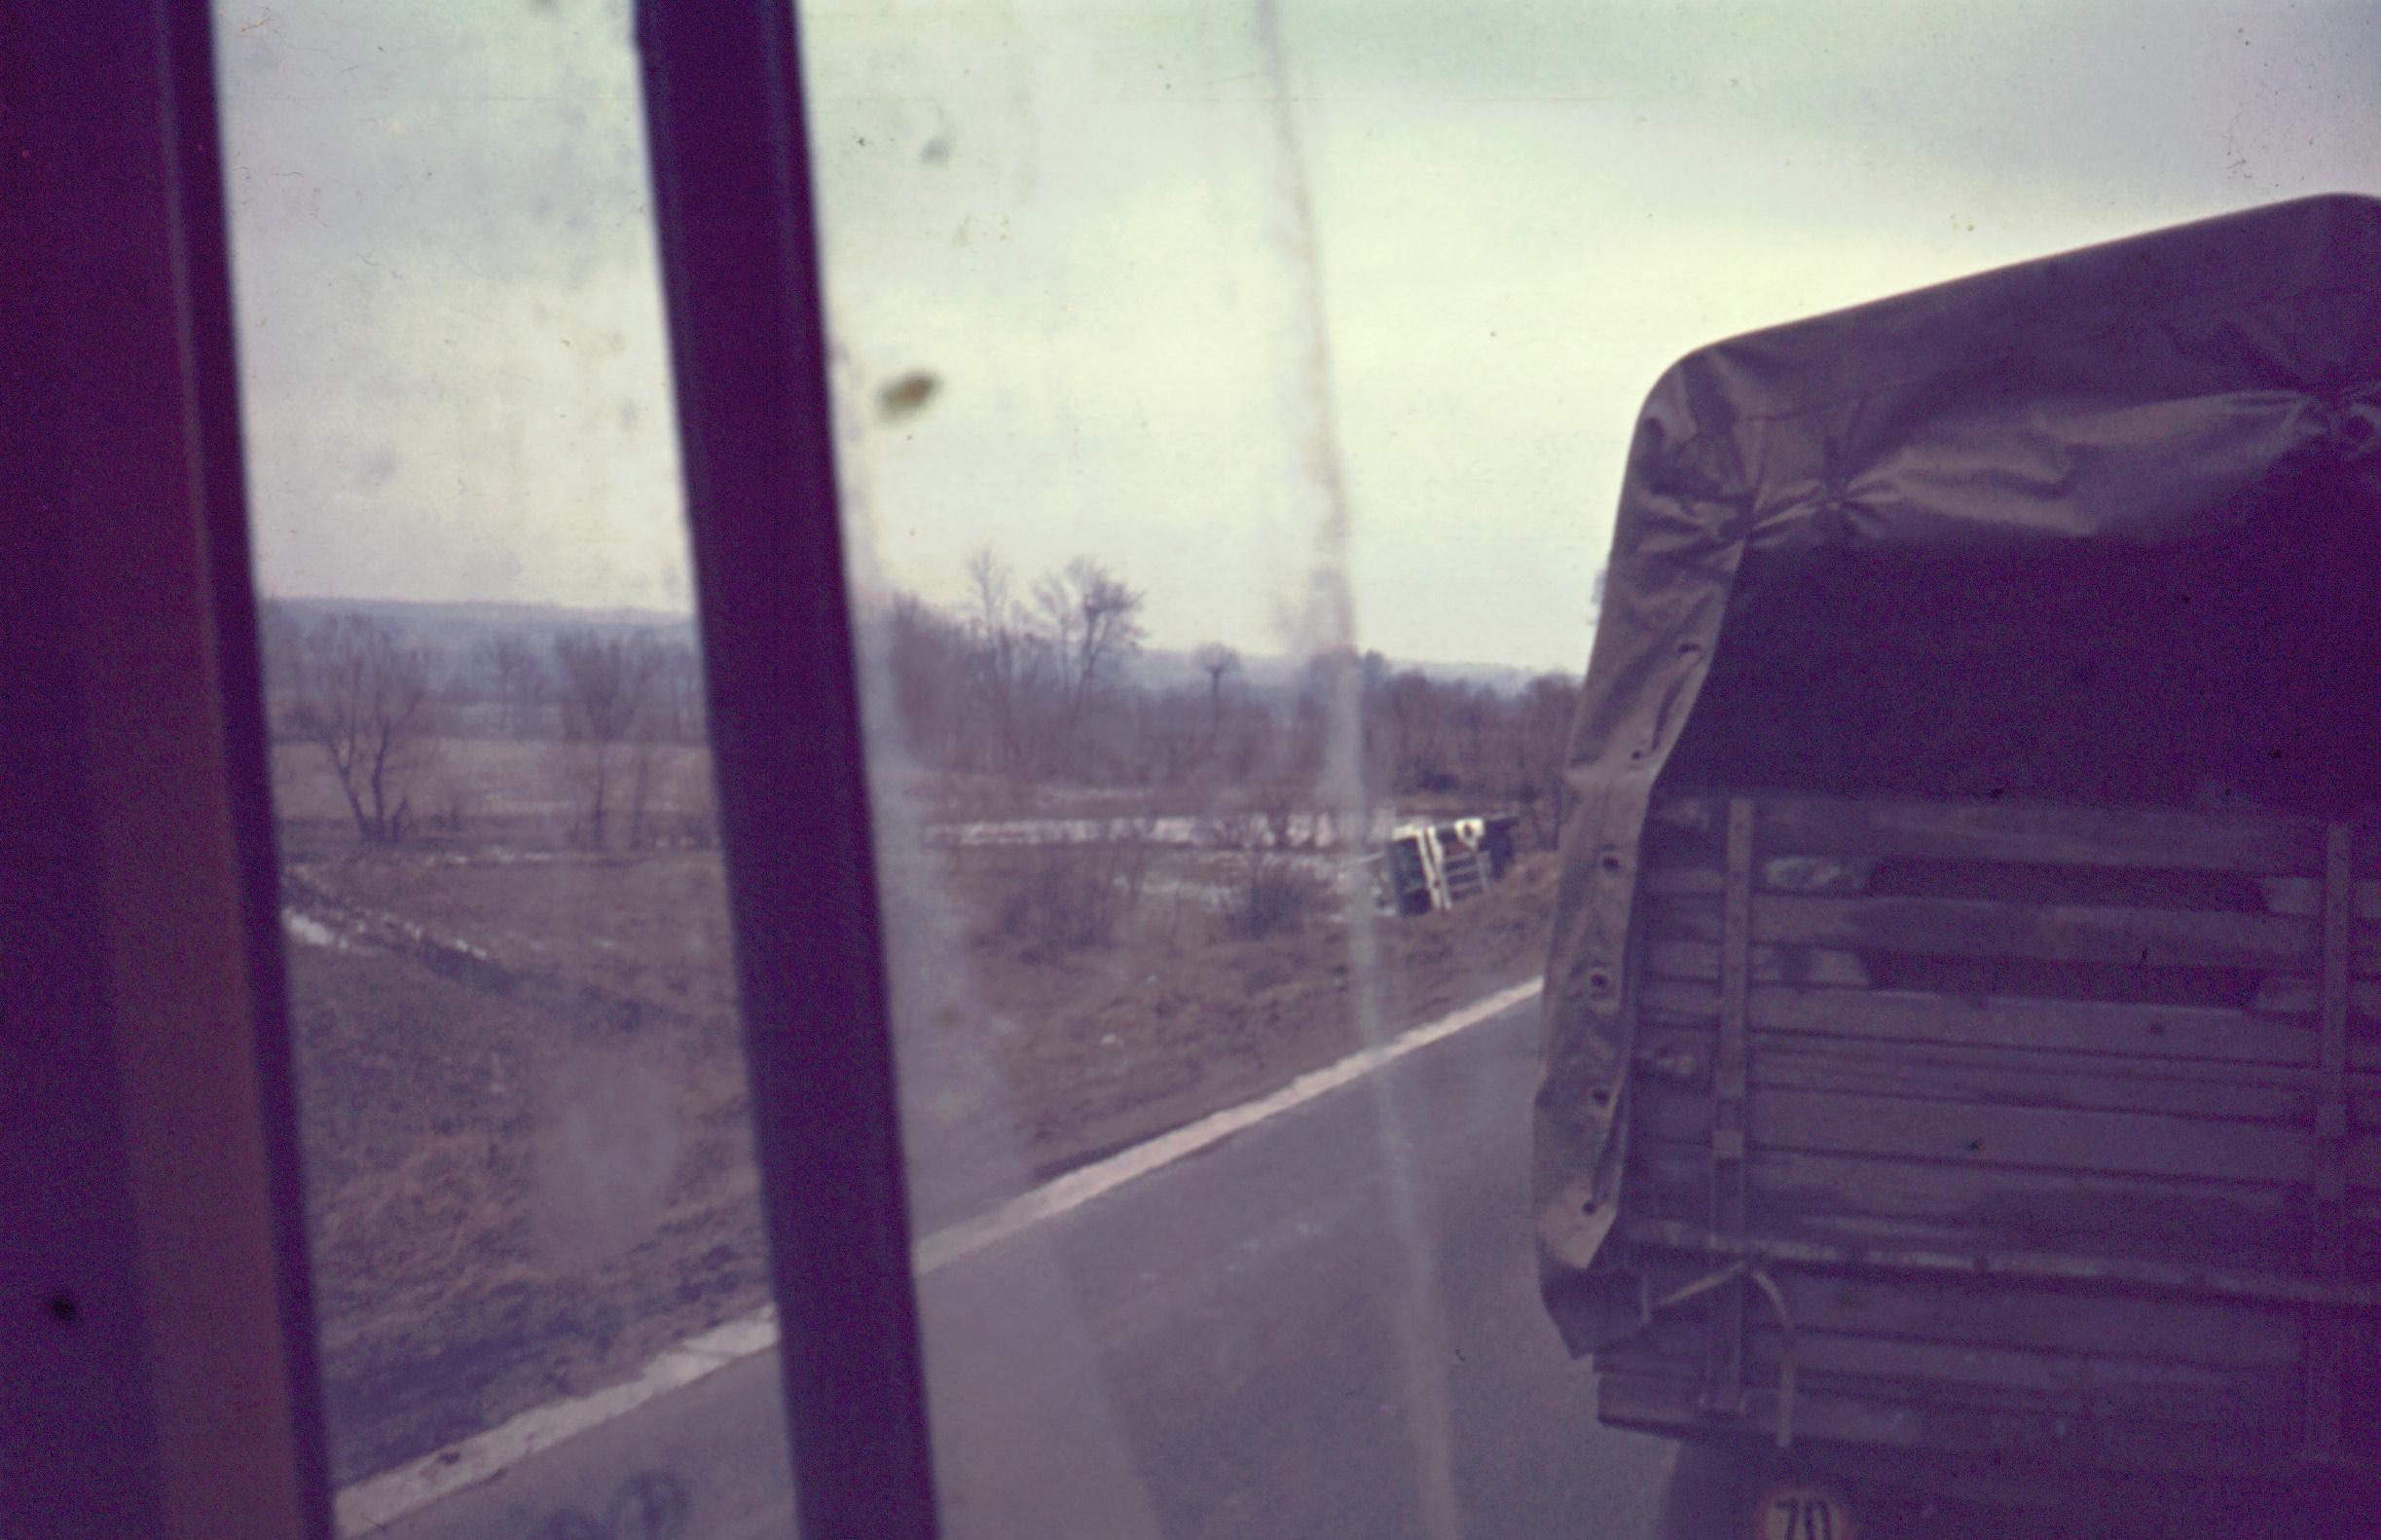 Jon-Honnef-met-Daf-naar-Iran-39